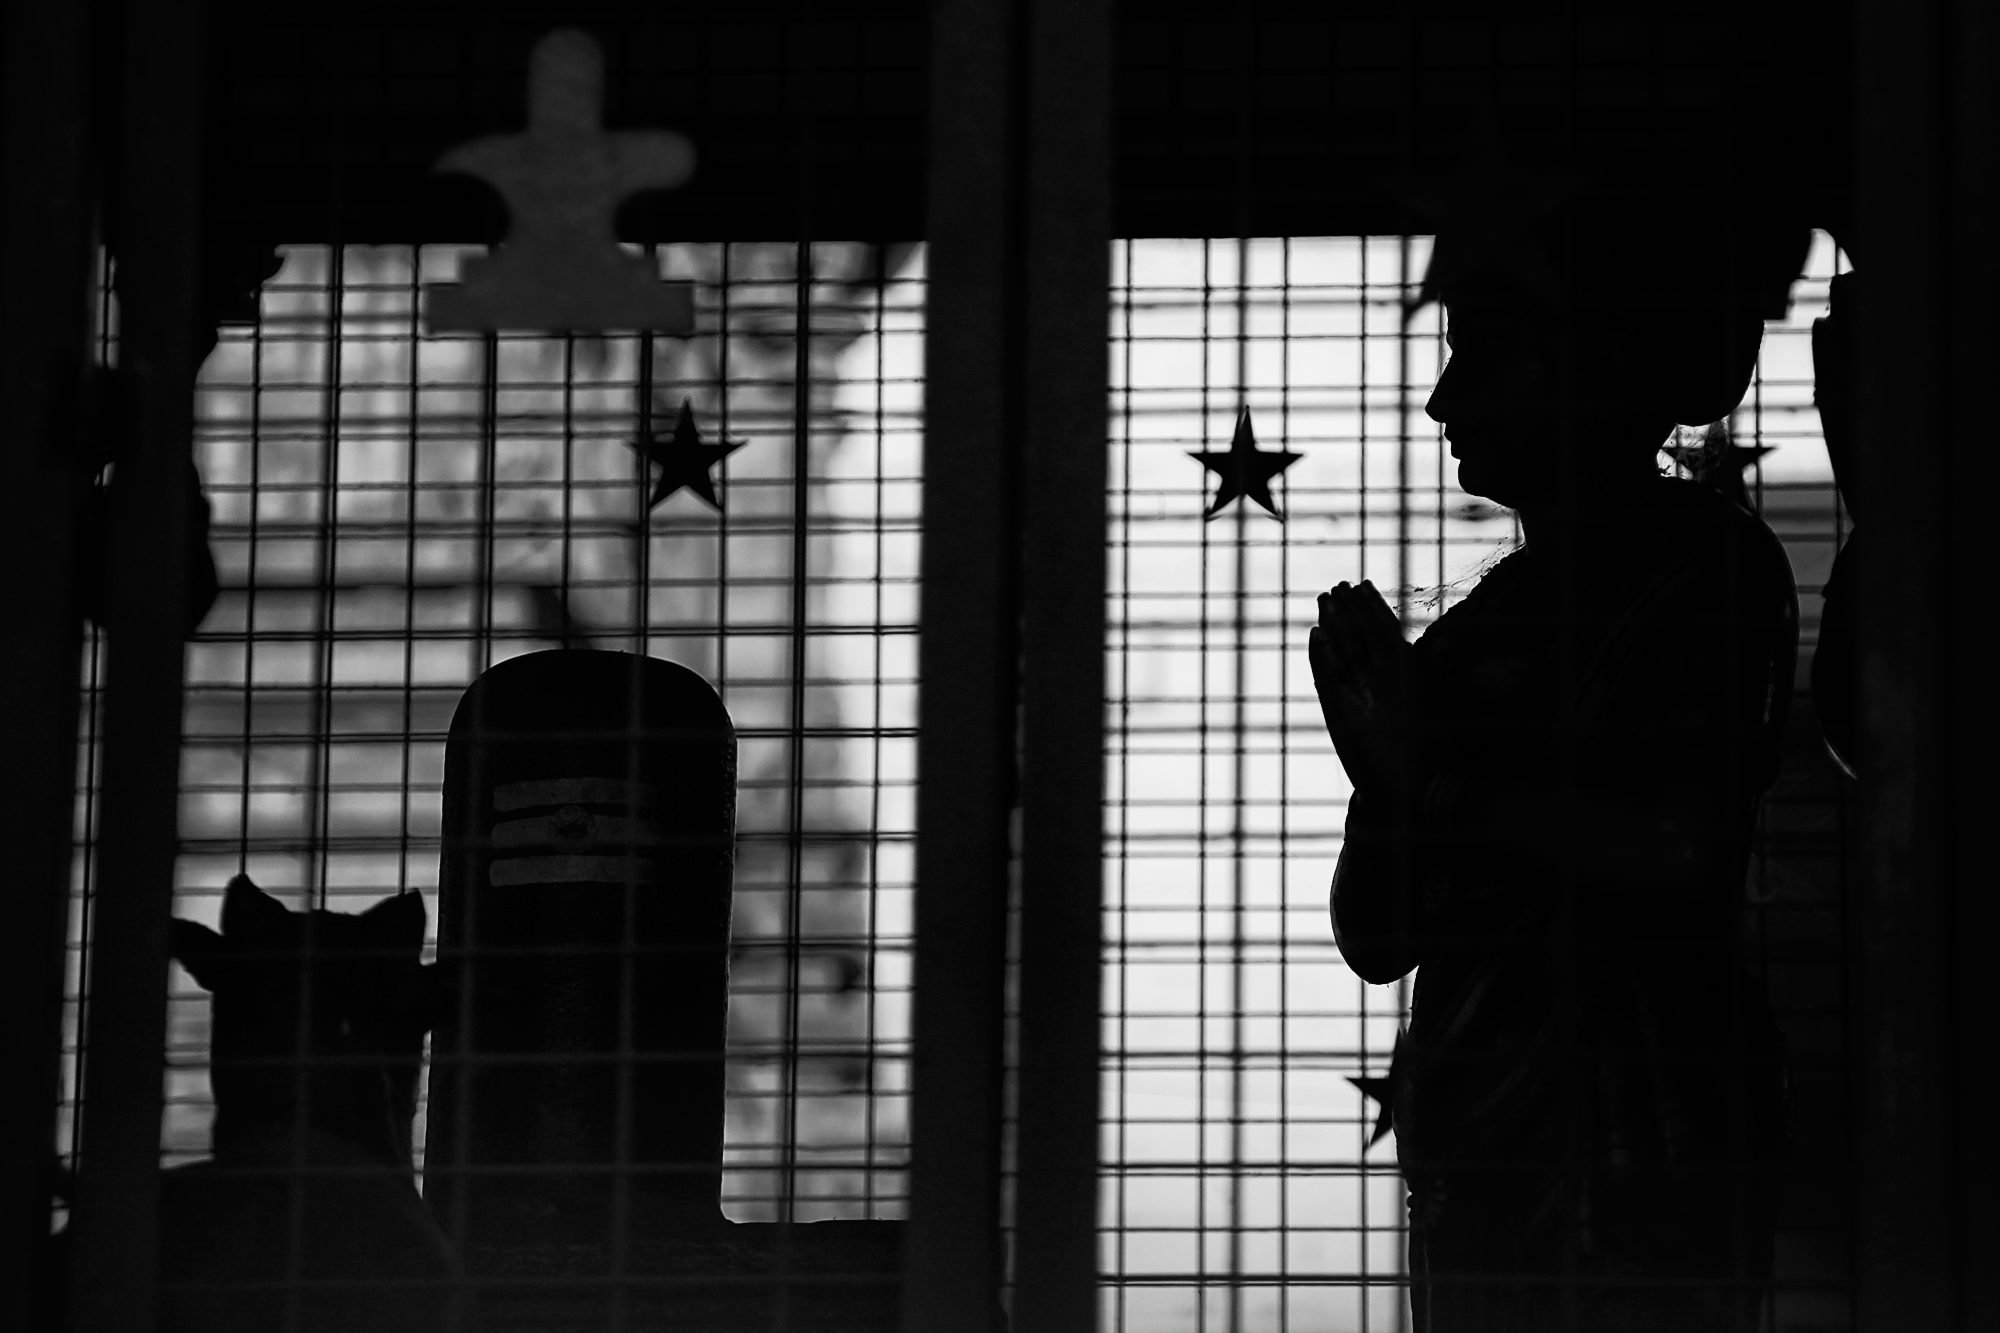 Author:  Vinoth Chandar   Author URL:  https://www.flickr.com/people/vinothchandar/   Title:  Prayer!!!   Year:  2013   Source:  Flickr